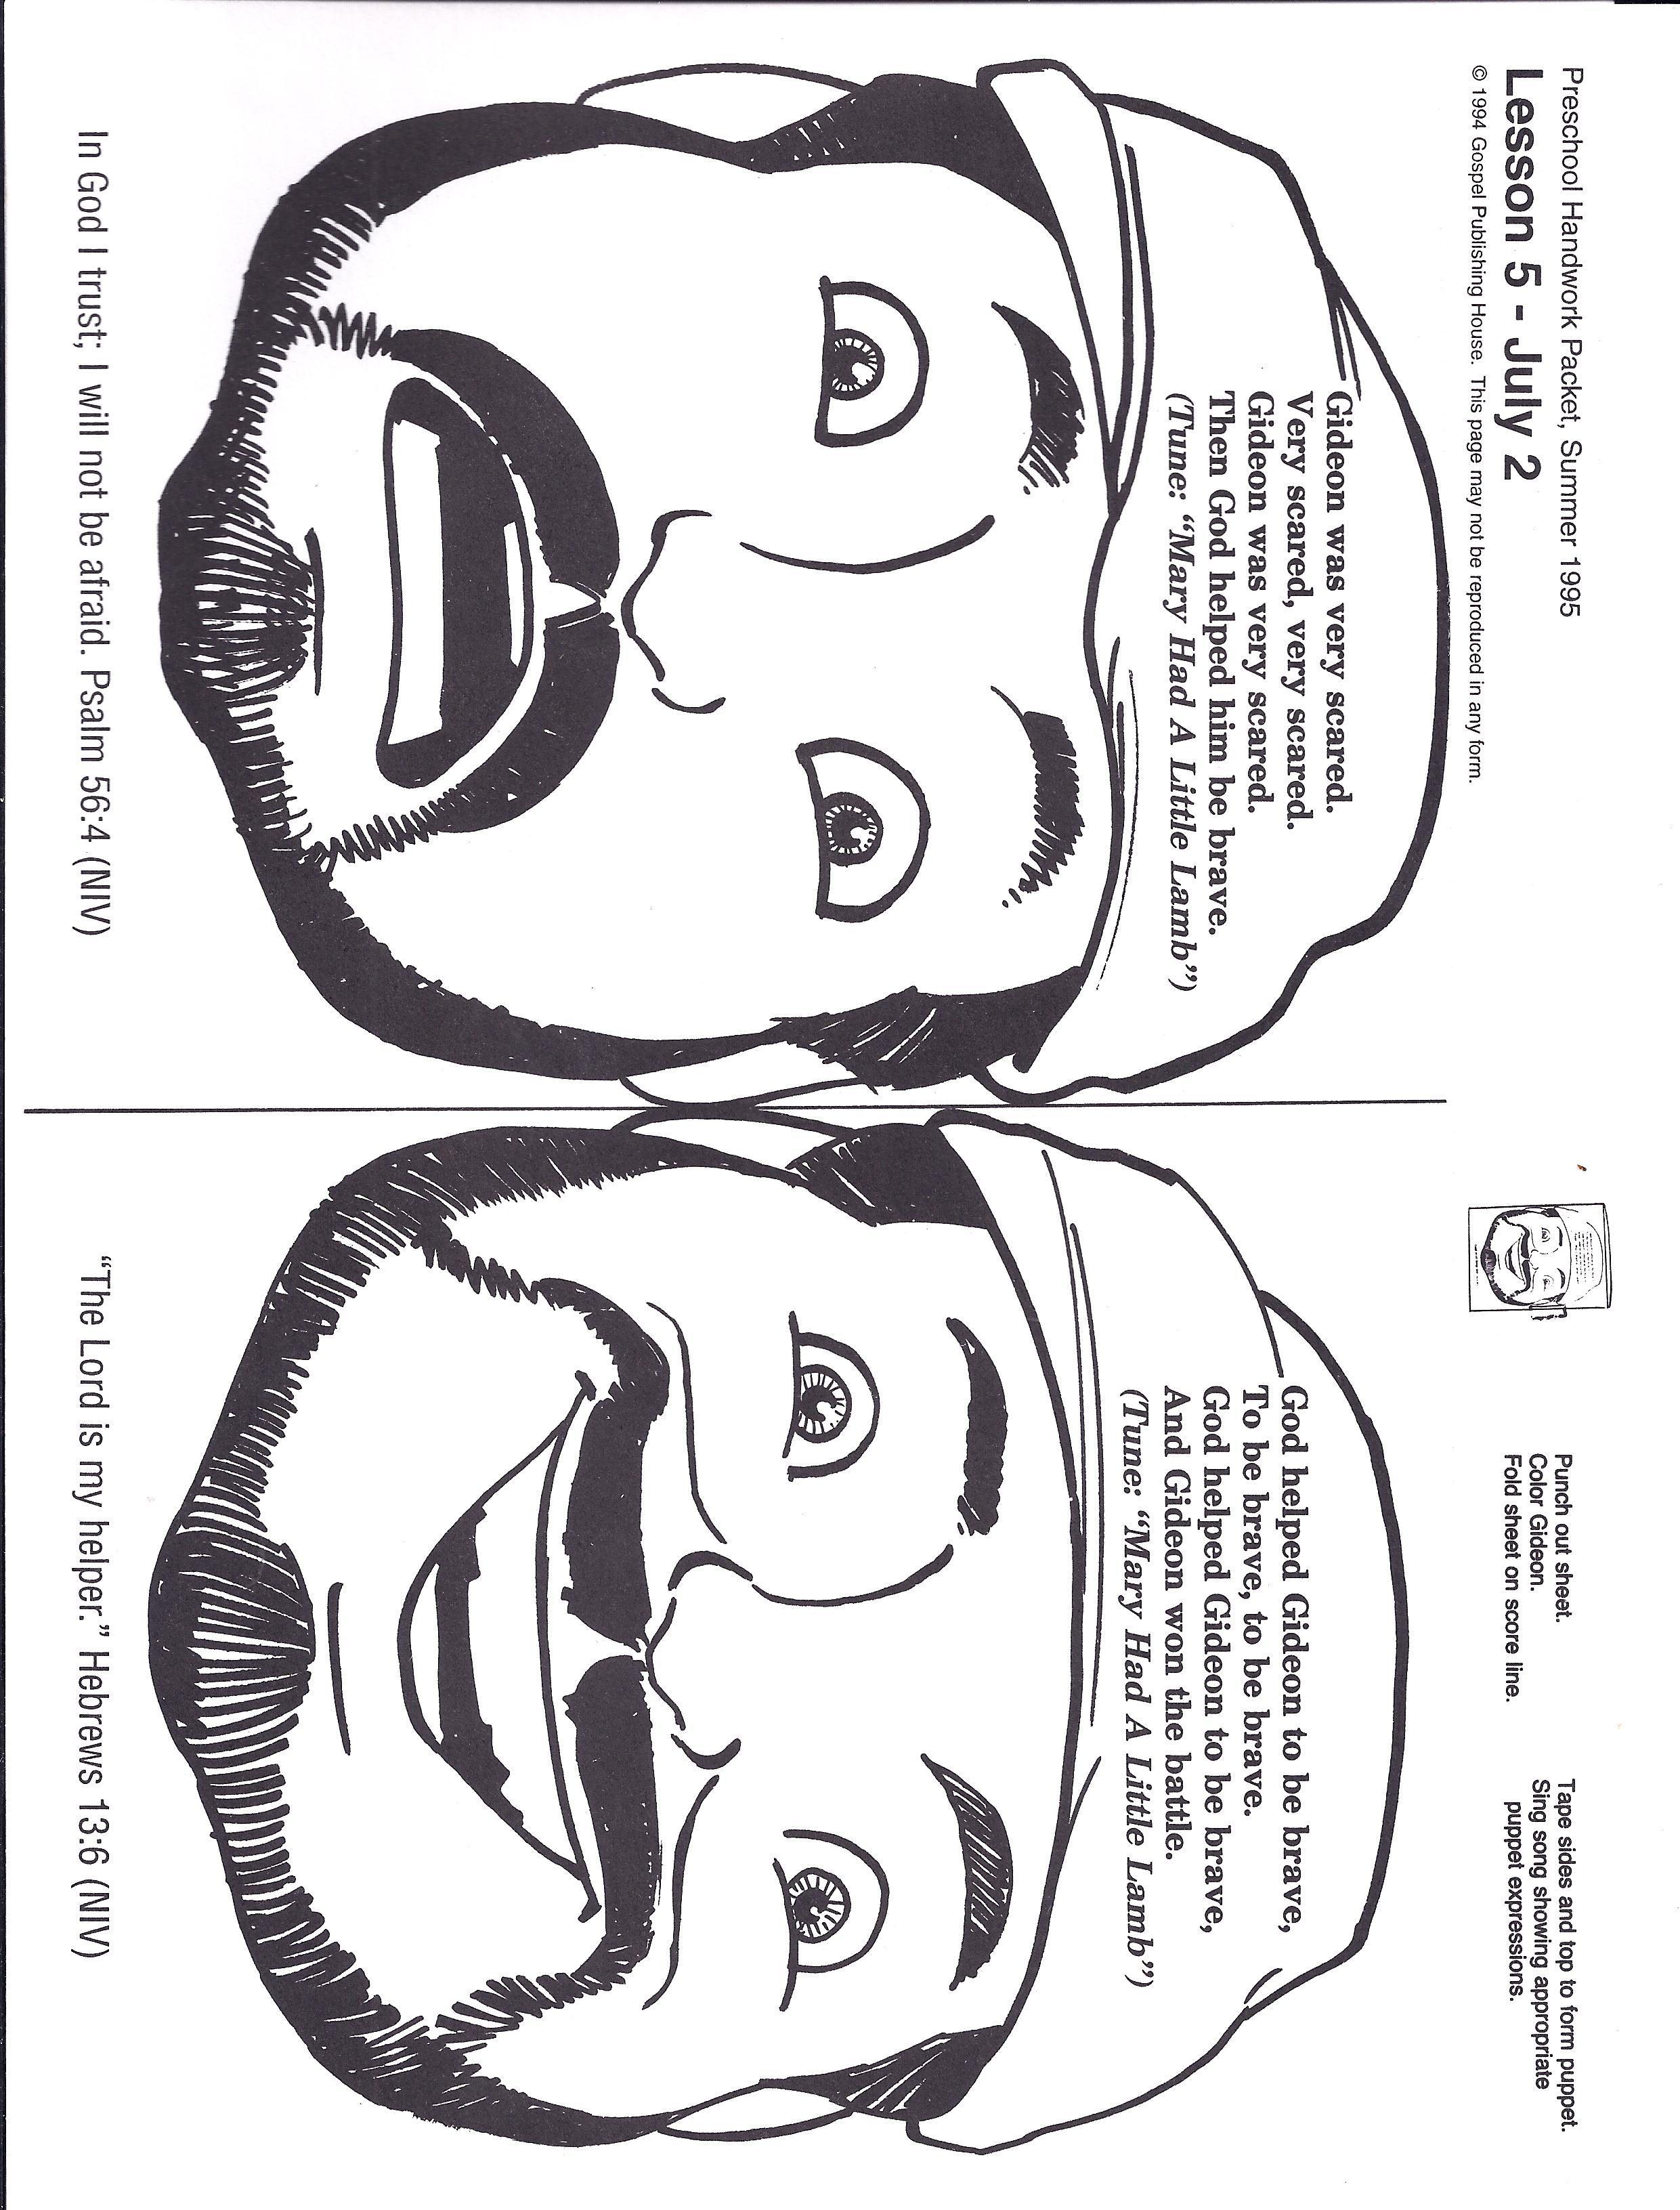 gideon coloring page - gideon pinteres